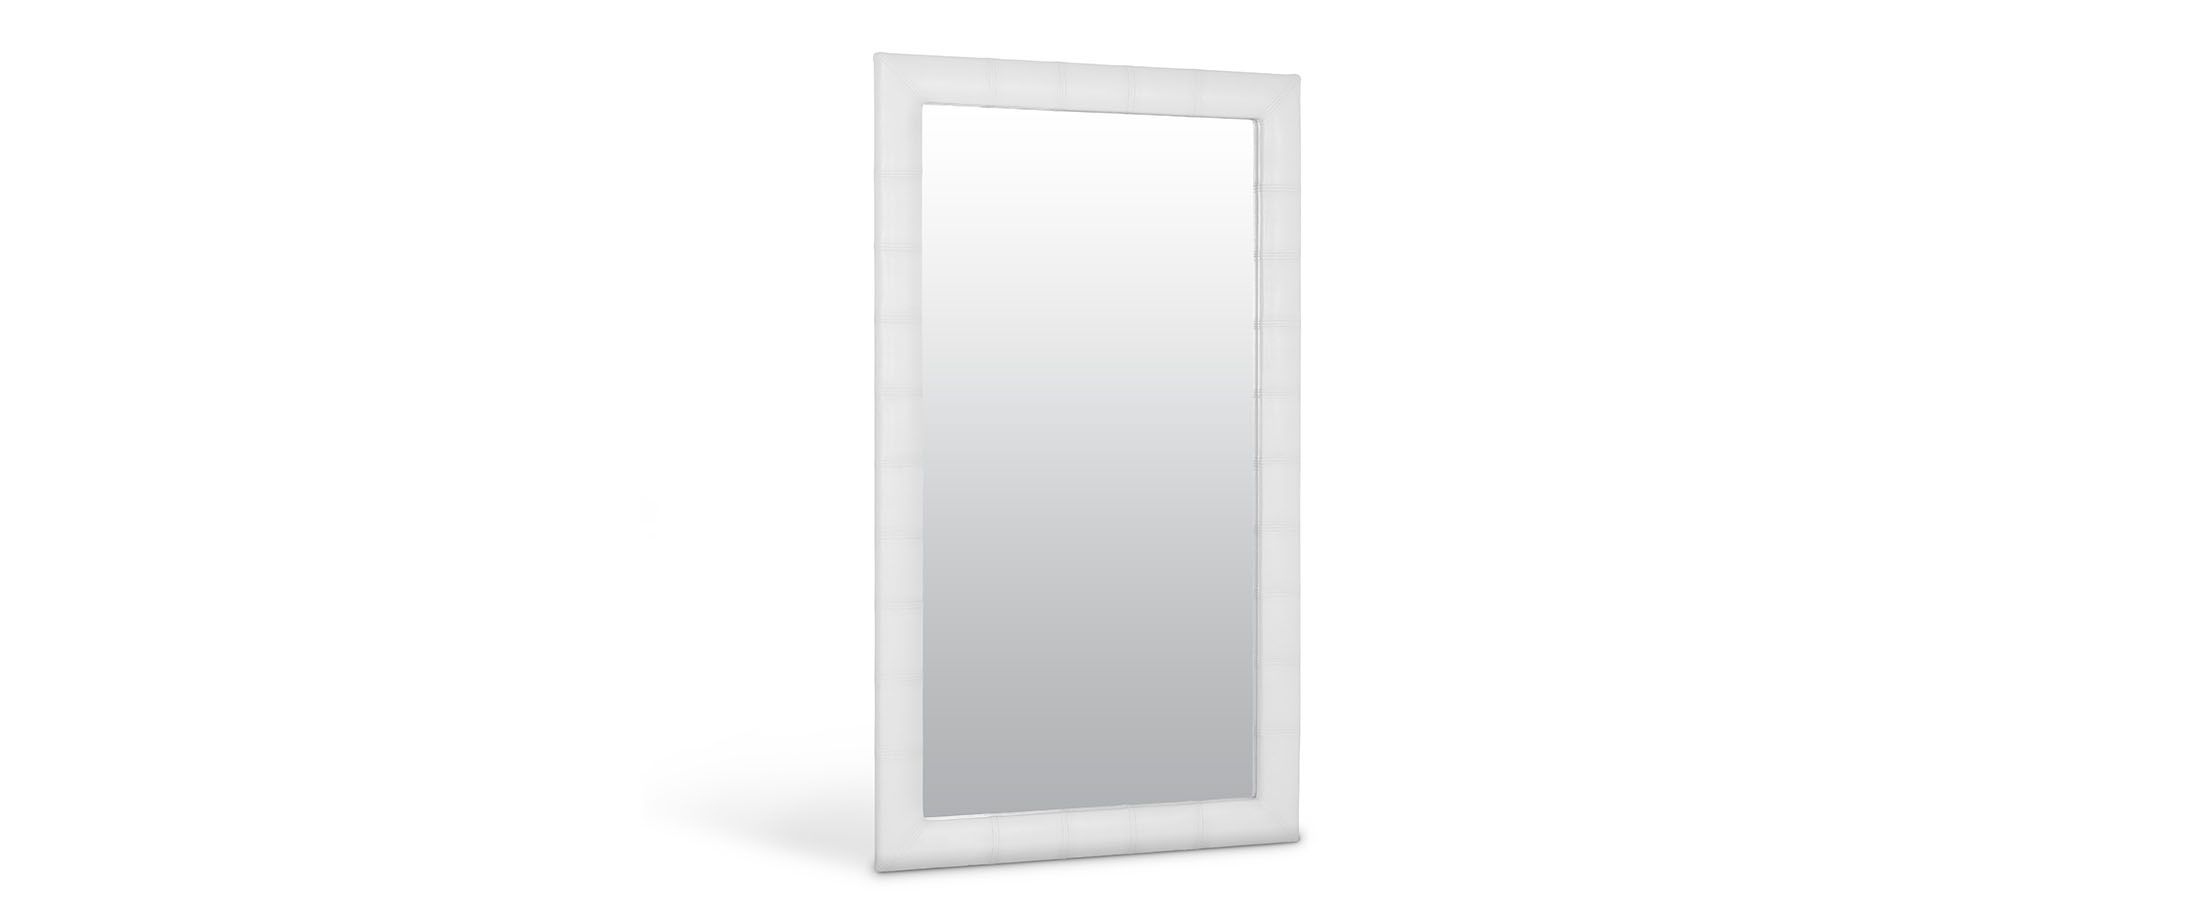 Зеркало Кааба большое марципан от MOON TRADE